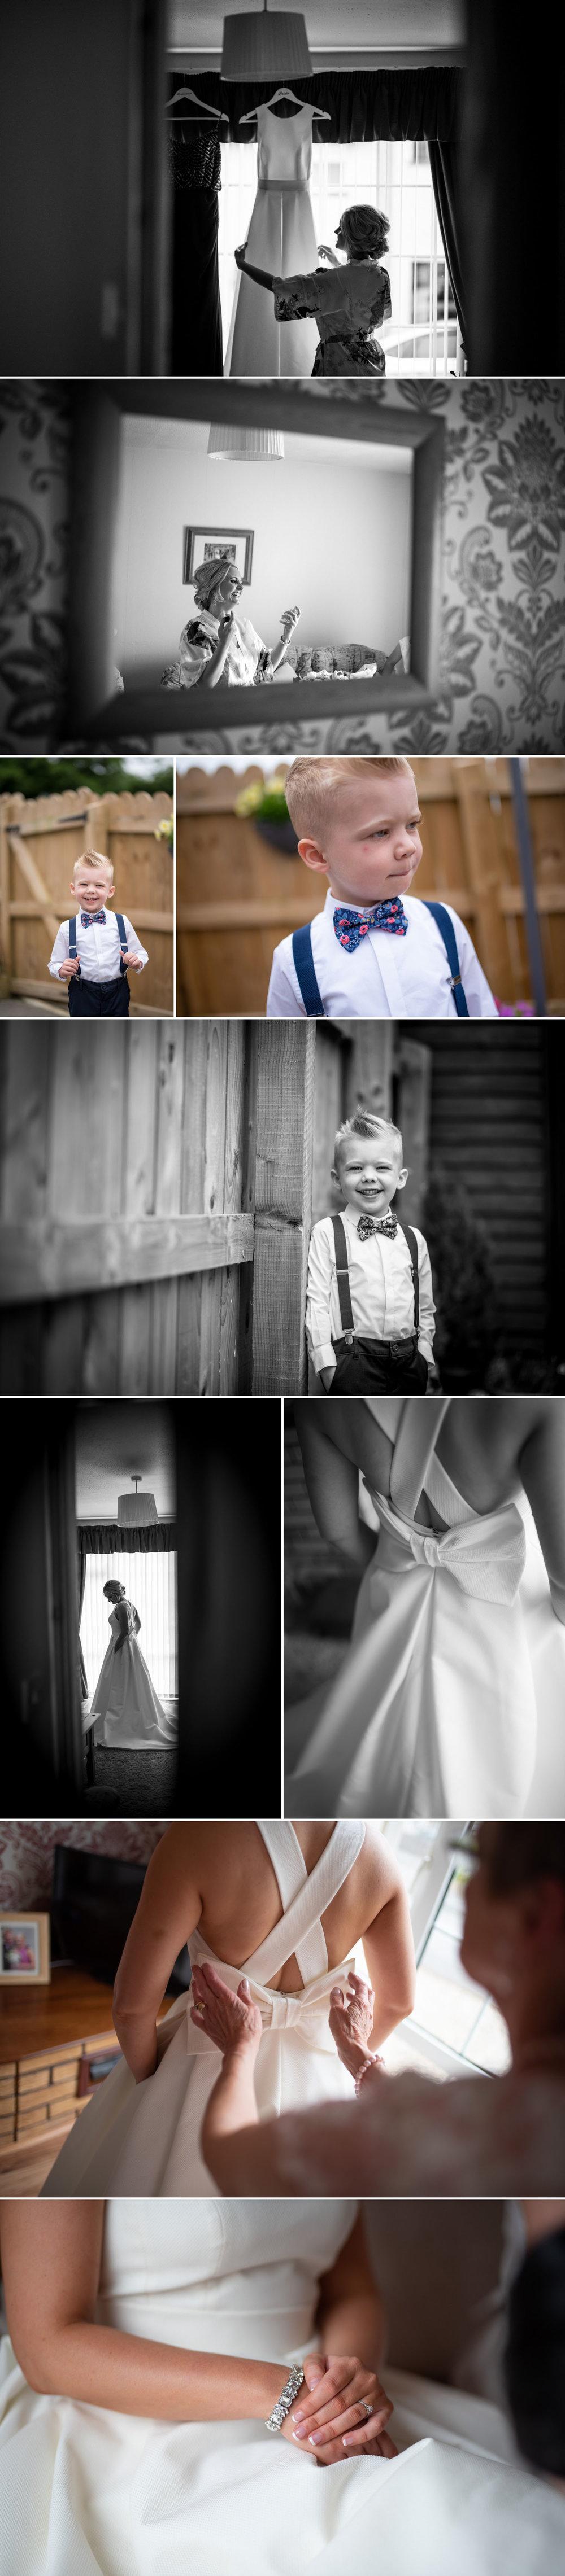 best wedding photographers northern ireland 19.jpg